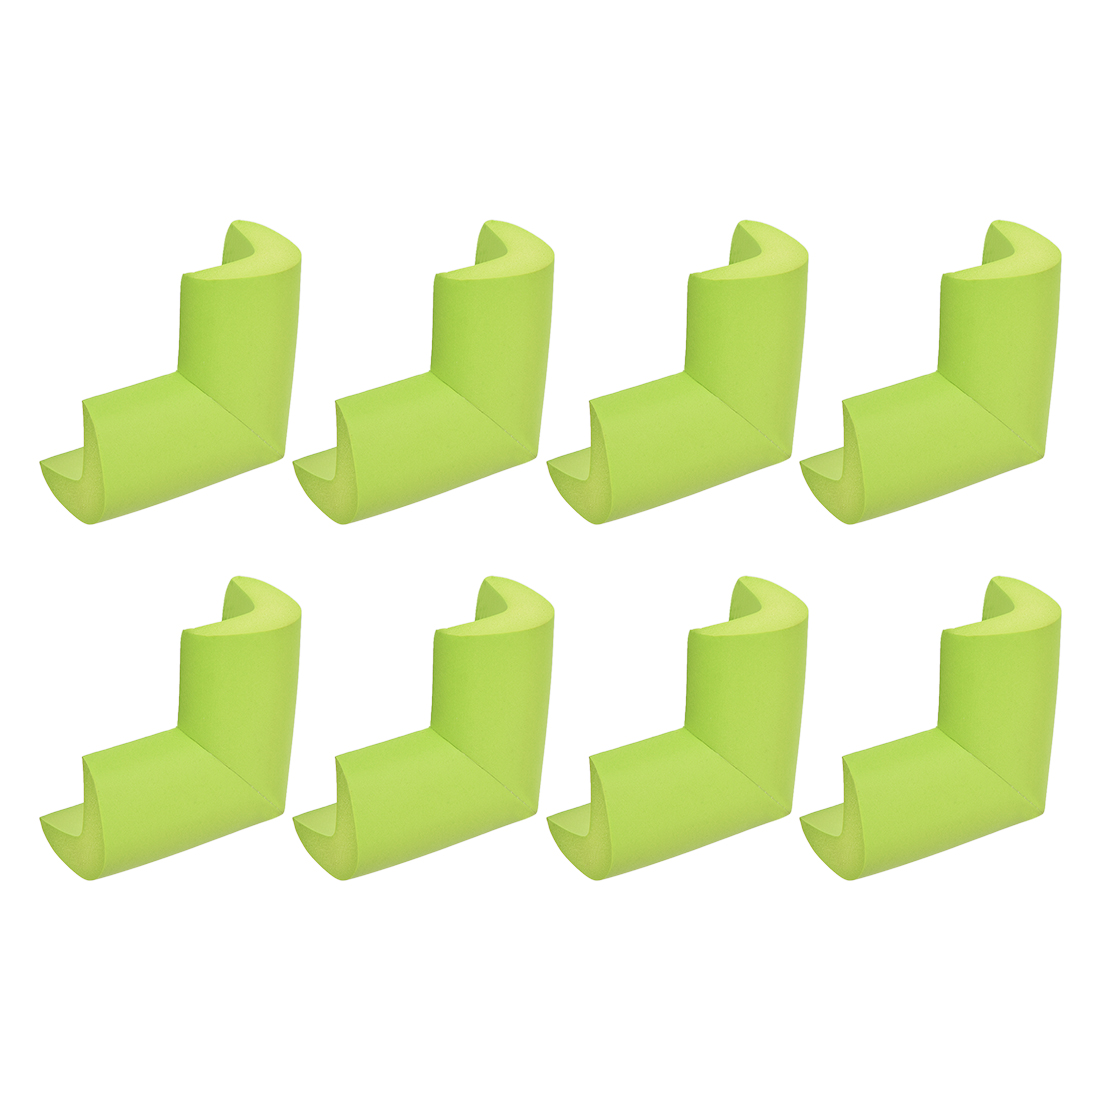 Corner Table Edge Guard Angle Cushion Protective Pad 50 x 35 x 15mm Green 8pcs